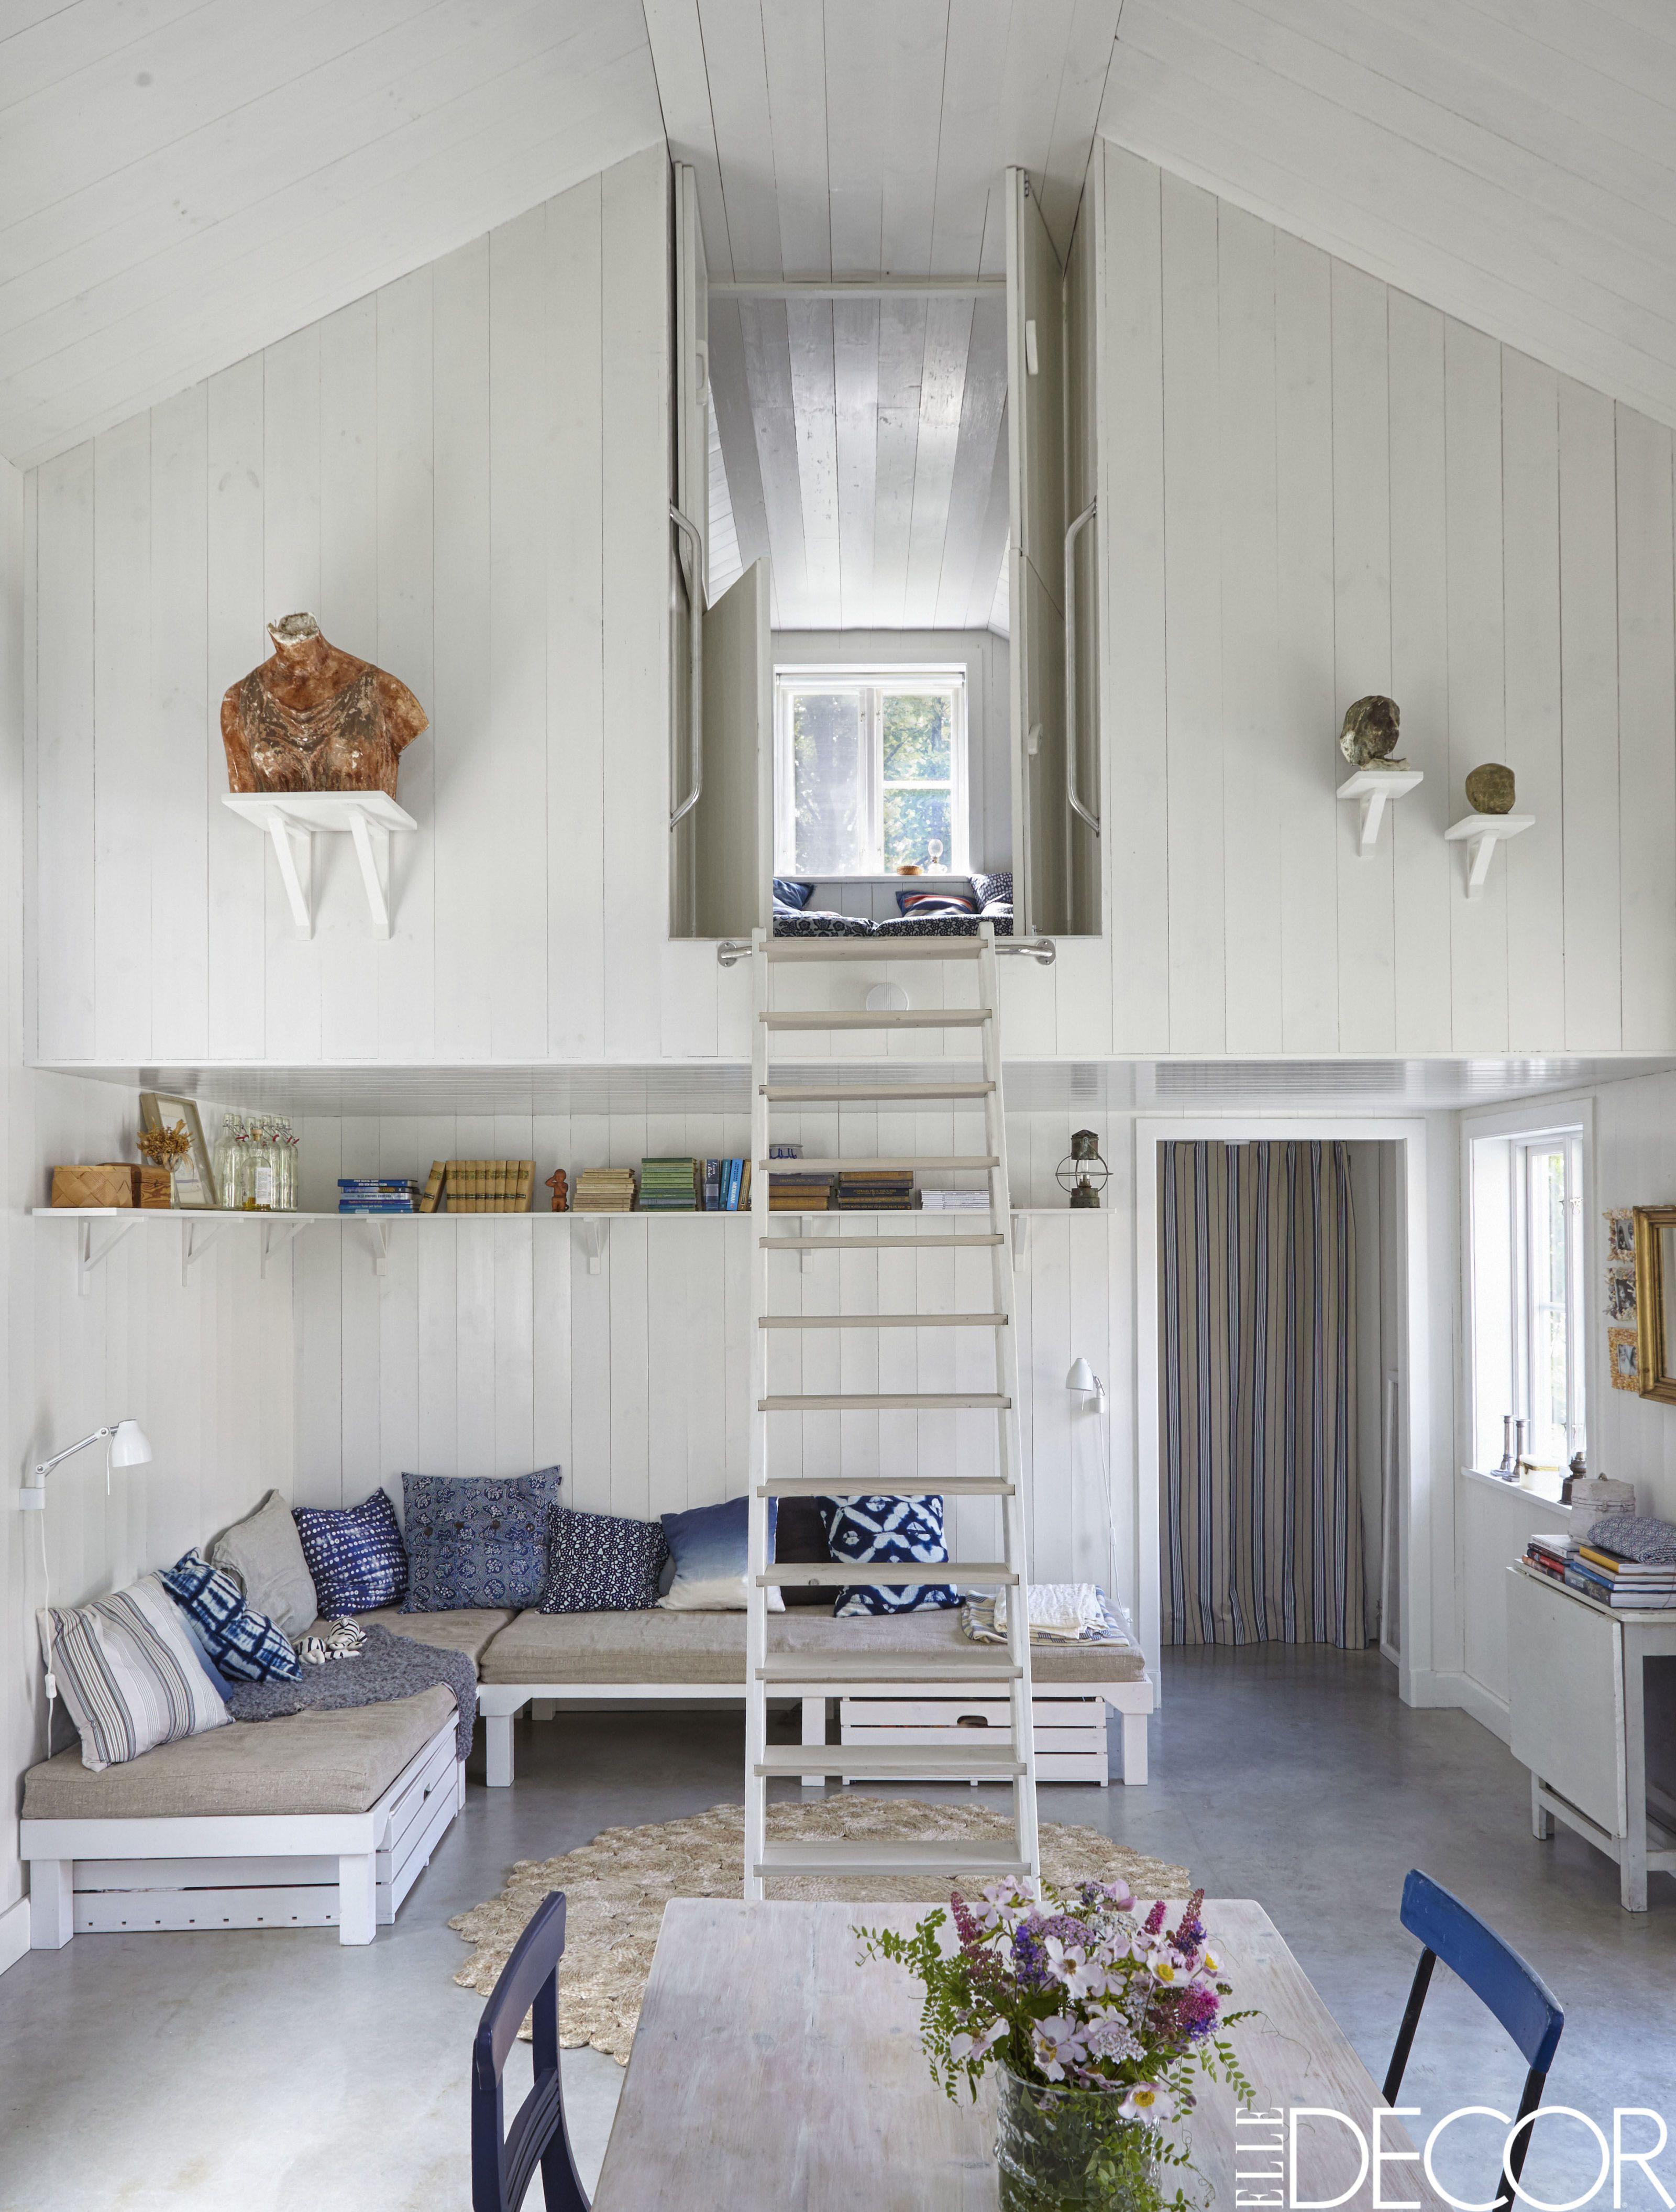 tour a minimalist cottage with scandinavian design summer house in rh elledecor com  swedish cottage style decorating ideas